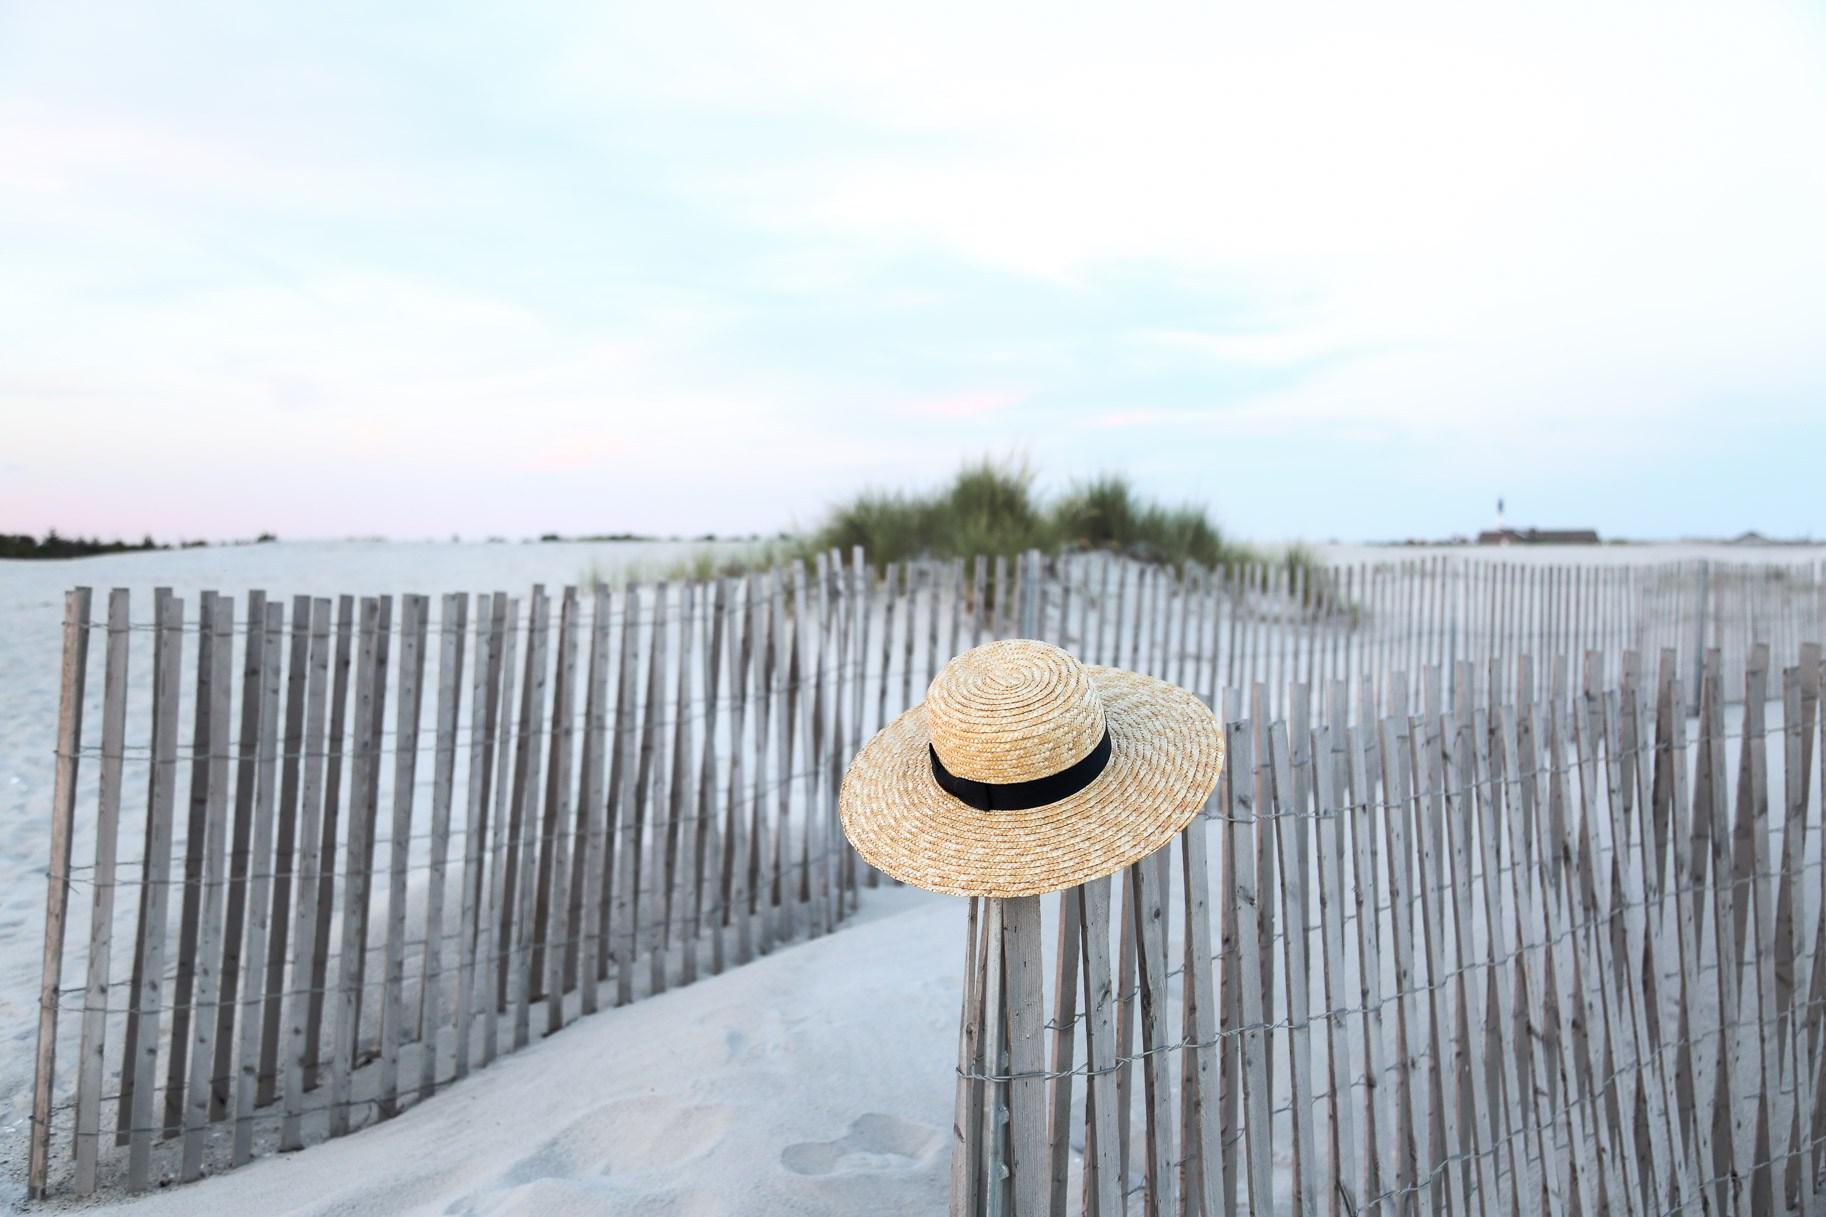 straw-beach-hat-.jpg